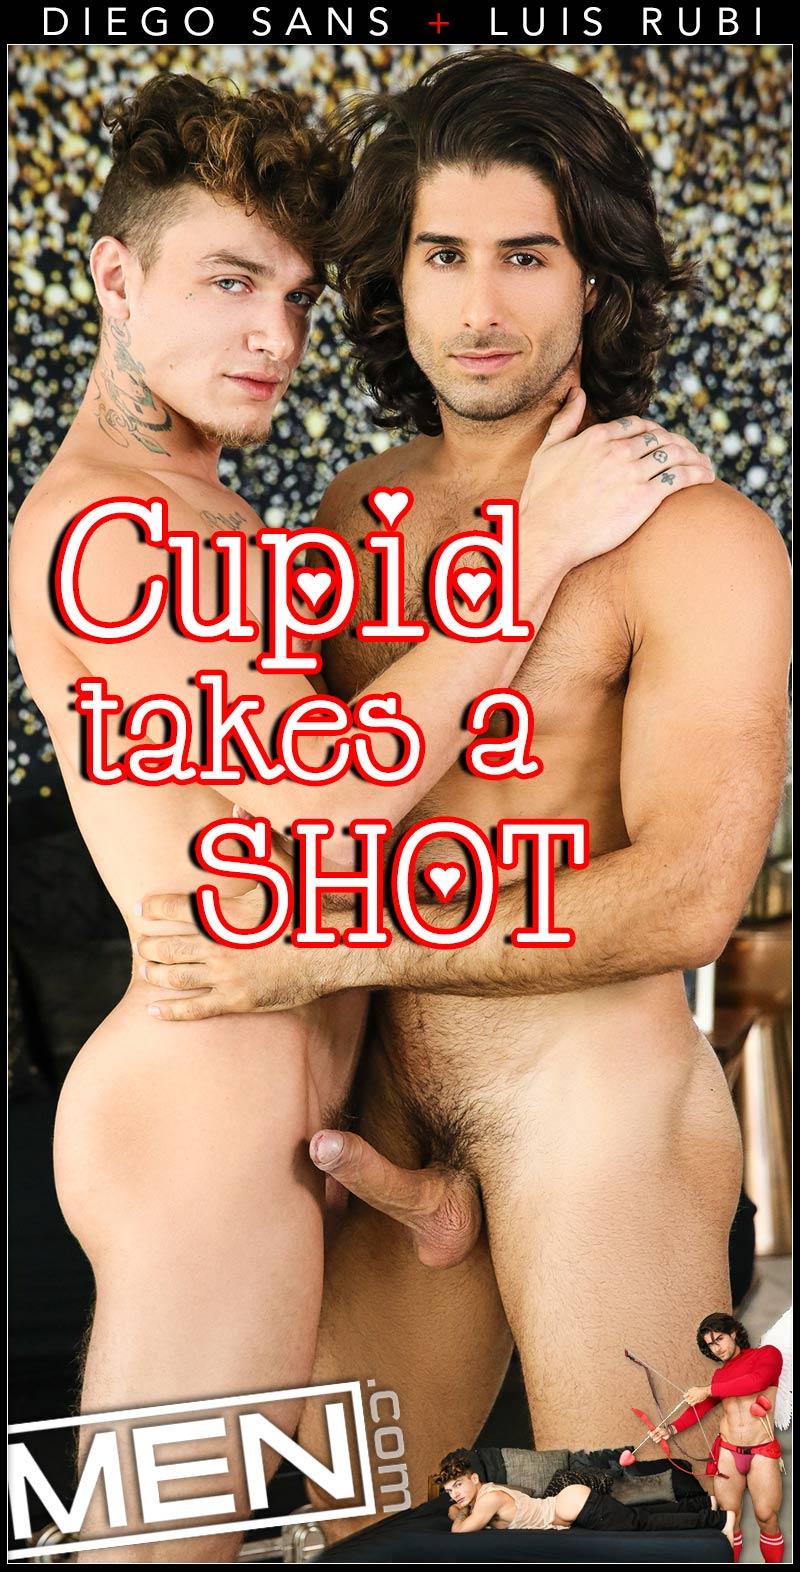 Cupid Takes A Shot (Diego Sans Fucks Luis Rubi) at Drill My Hole